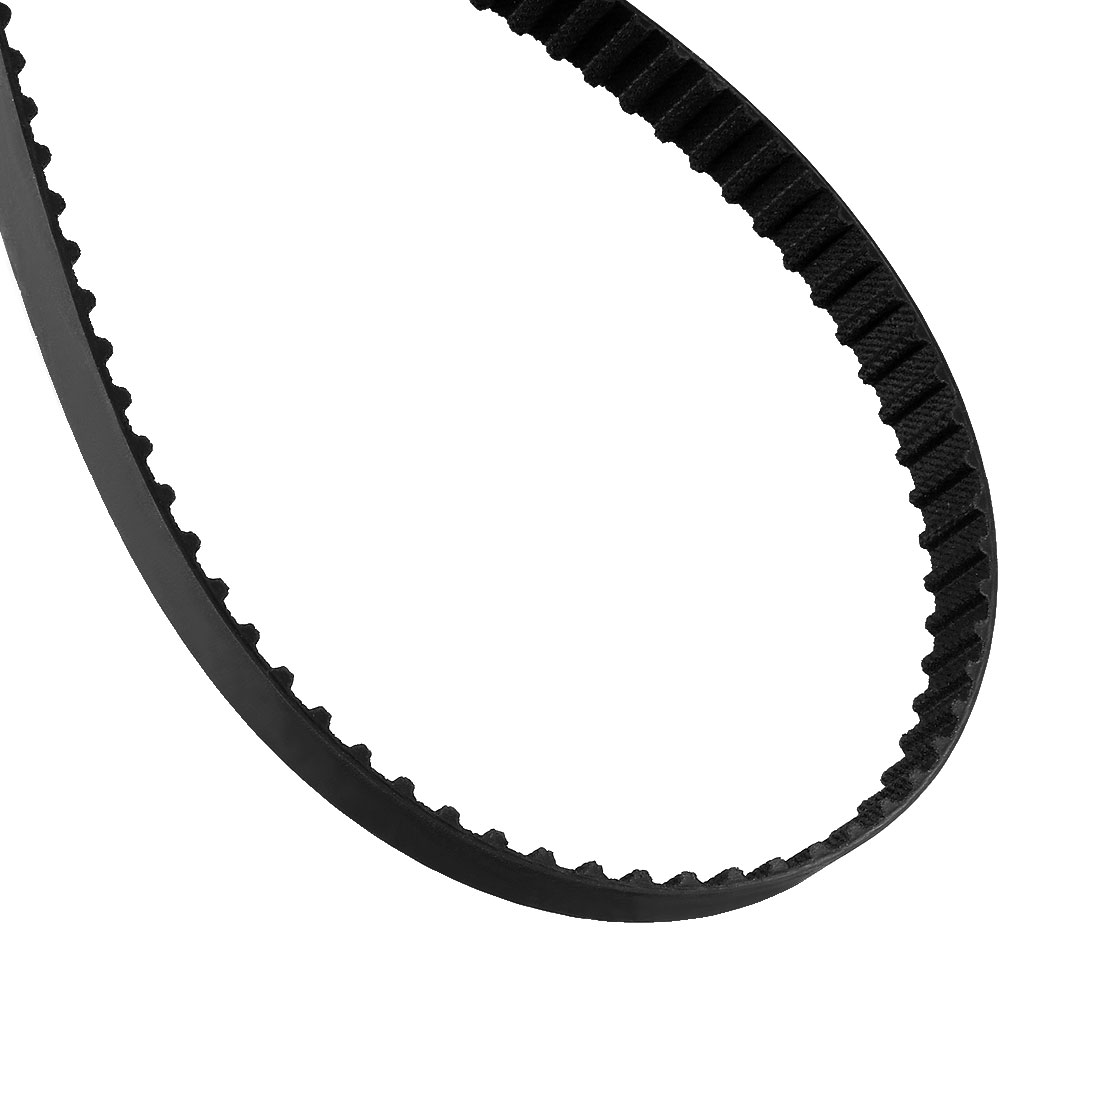 372XL 186 Teeth 10mm Width 5.08mm Pitch Stepper Motor Rubber Timing Belt Black